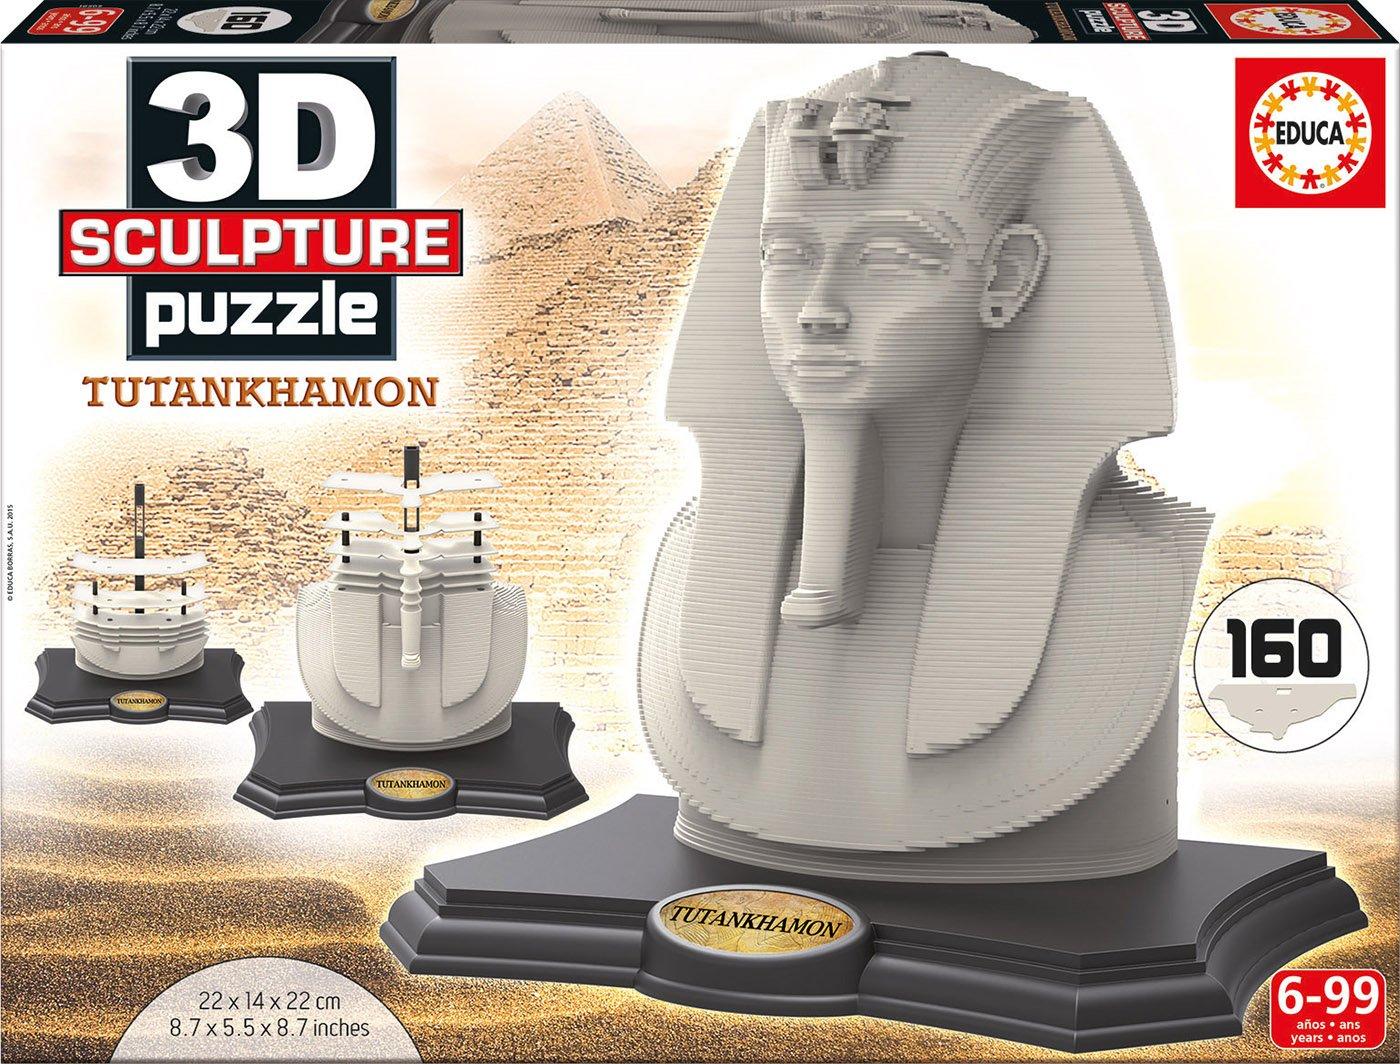 D Sculpture Puzzle con diseño Tutankhamon Educa Borras